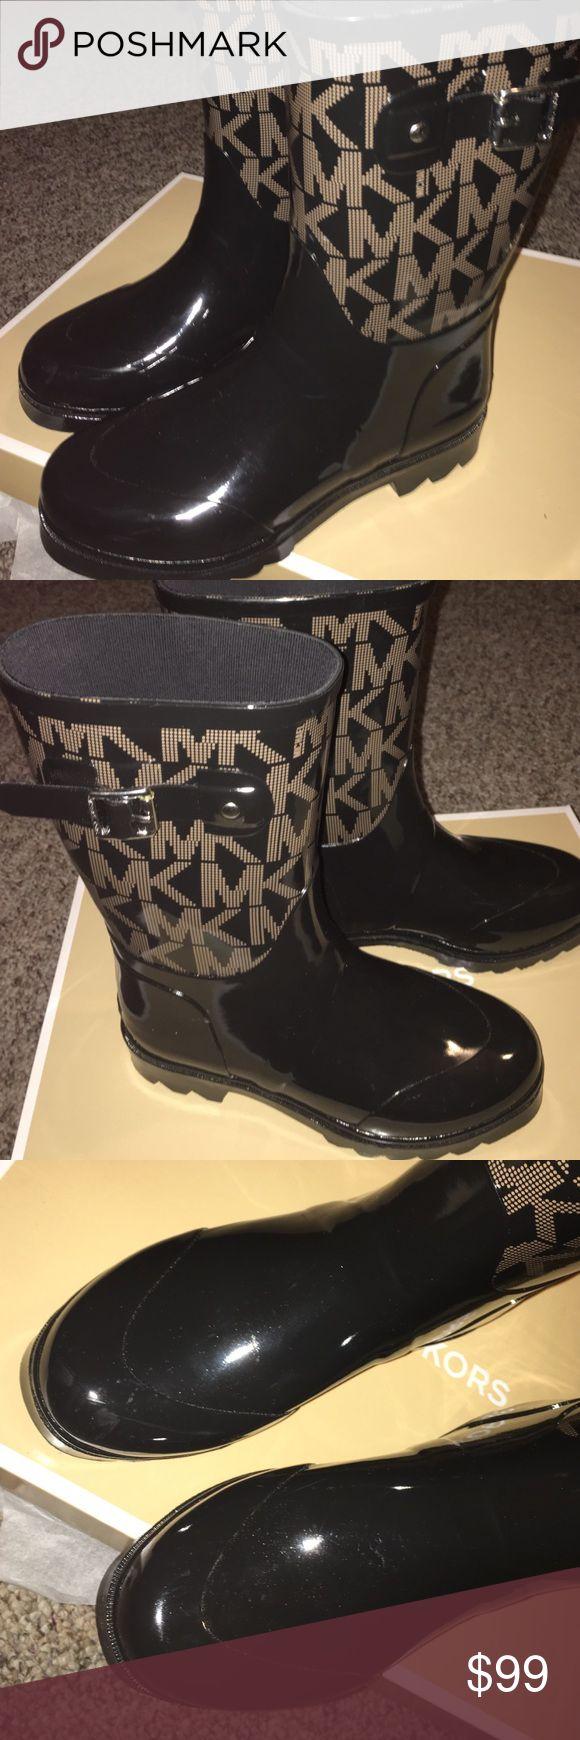 Michael Kors Rain boots - Brand New!!! Brand New with box MK rain boots. Size7. Michael Kors Shoes Winter & Rain Boots